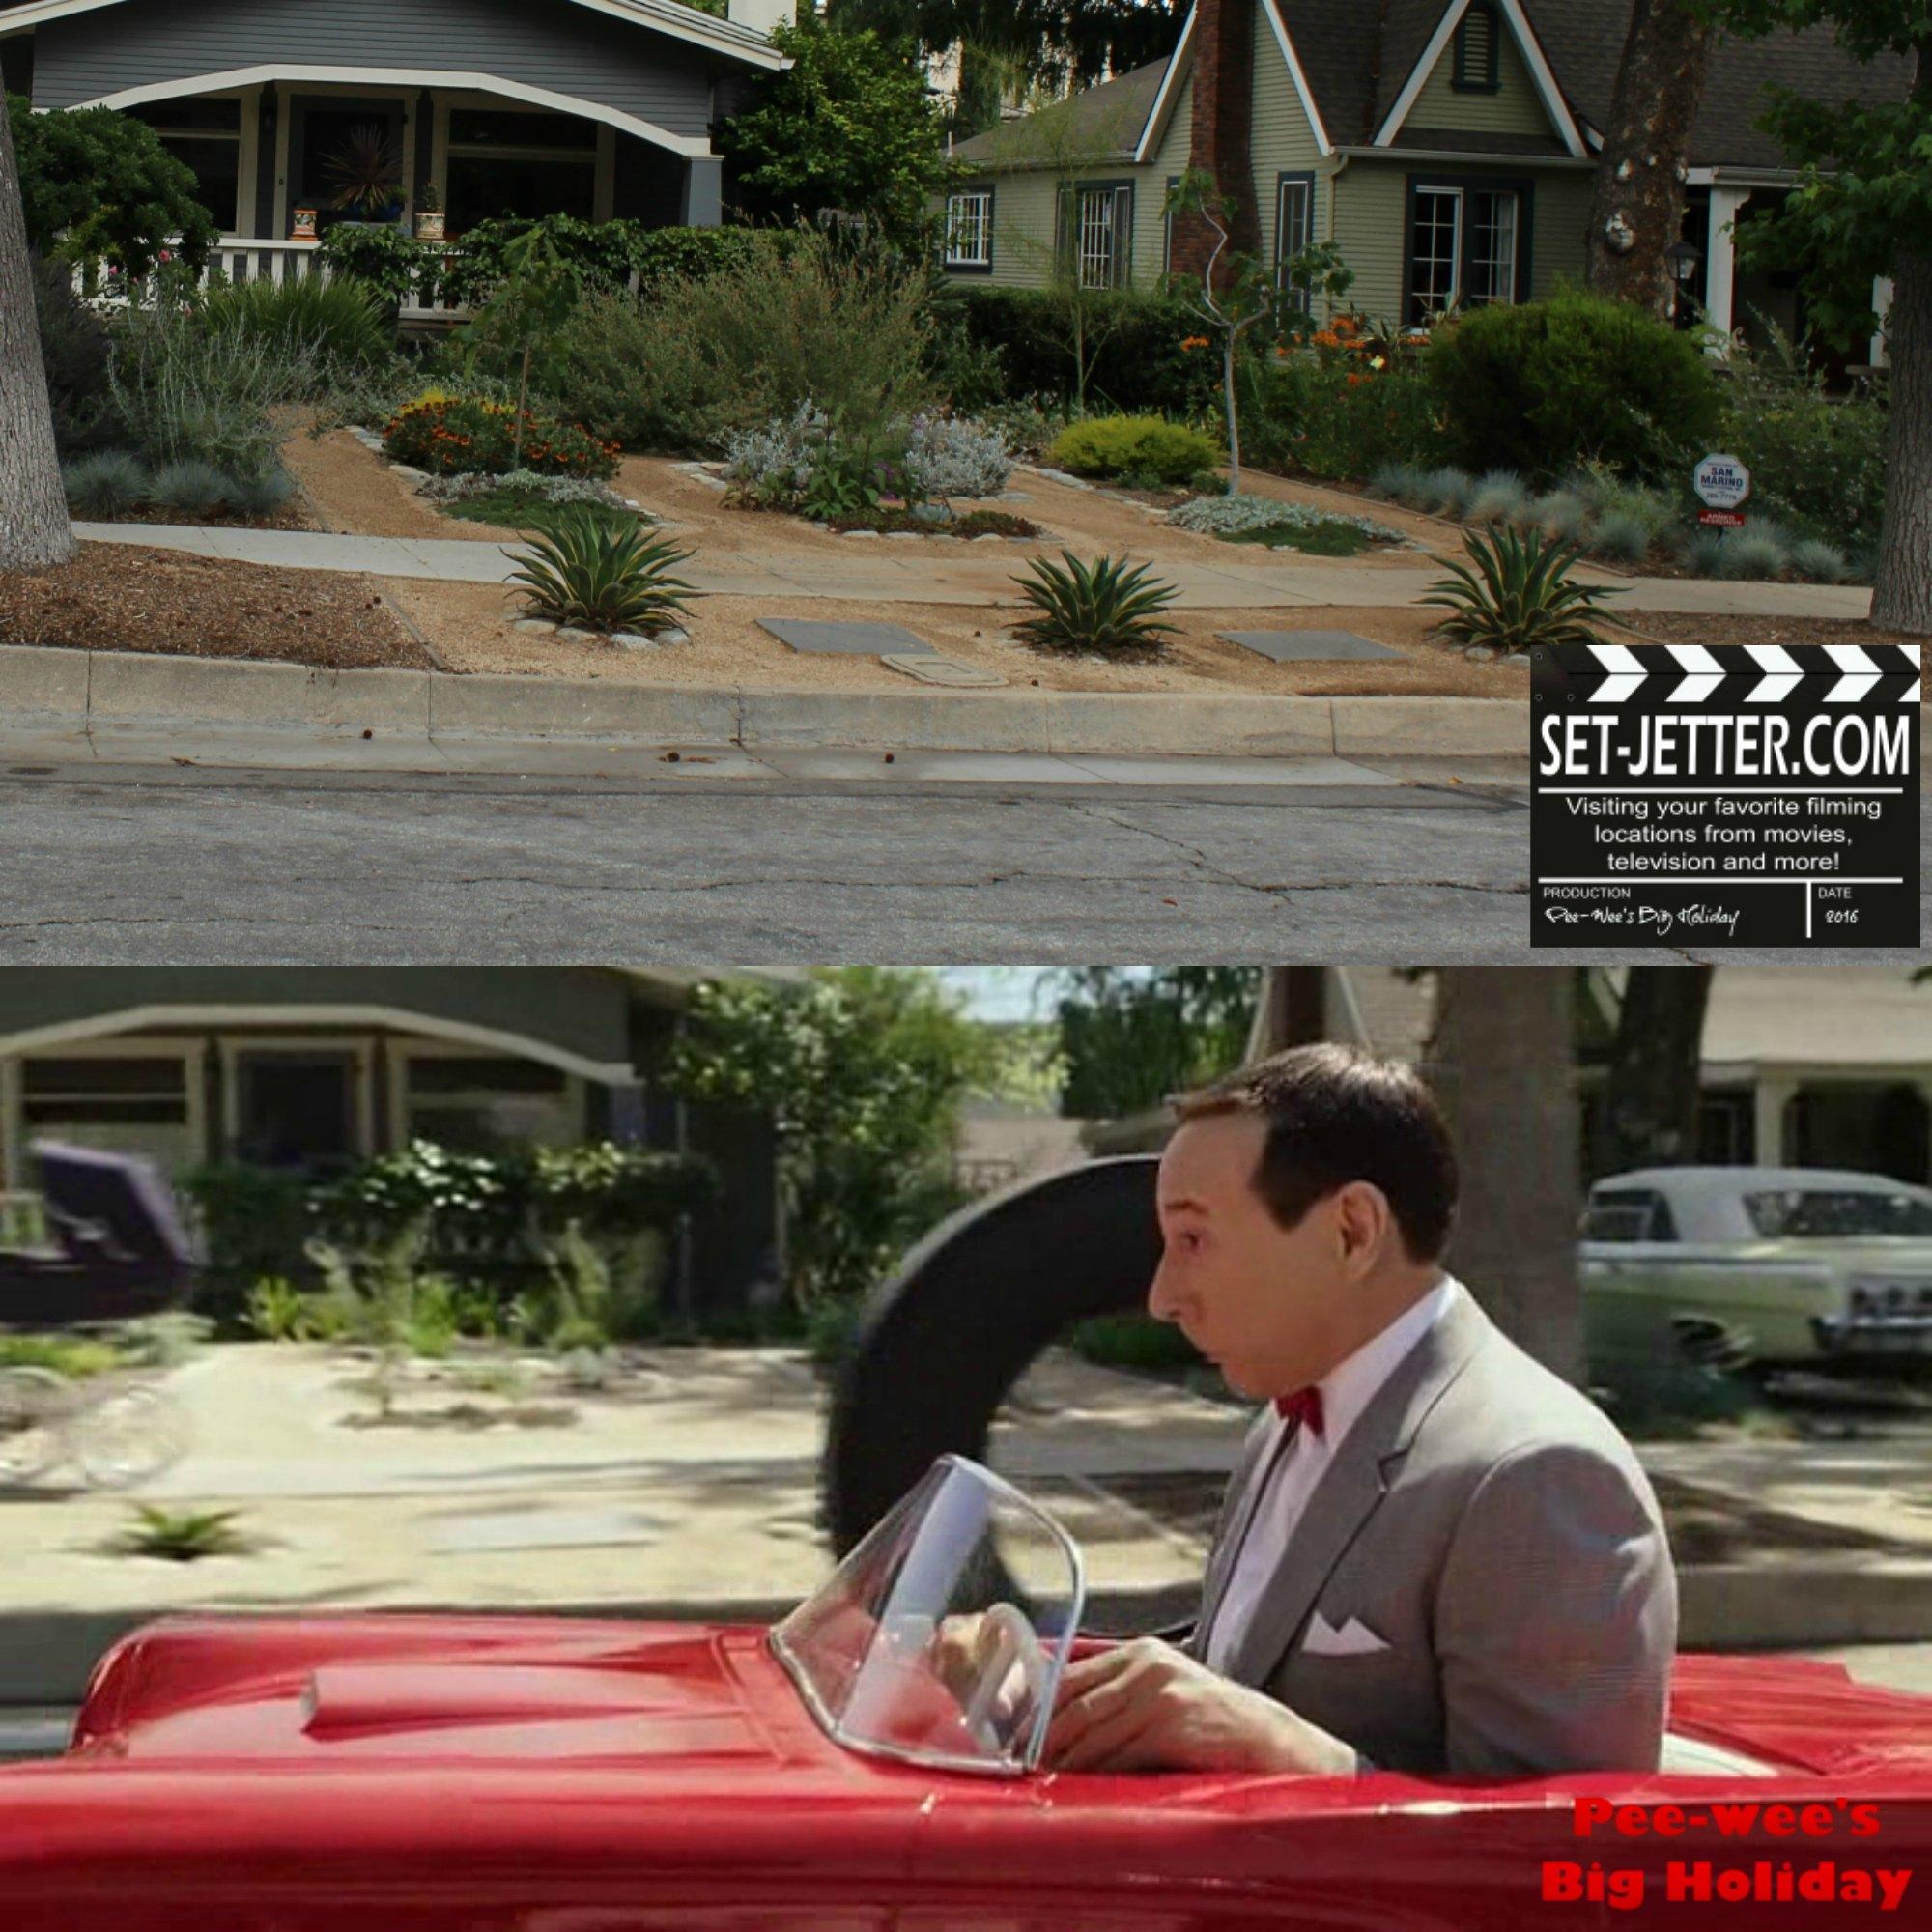 Pee Wee's Big Holiday comparison 216.jpg